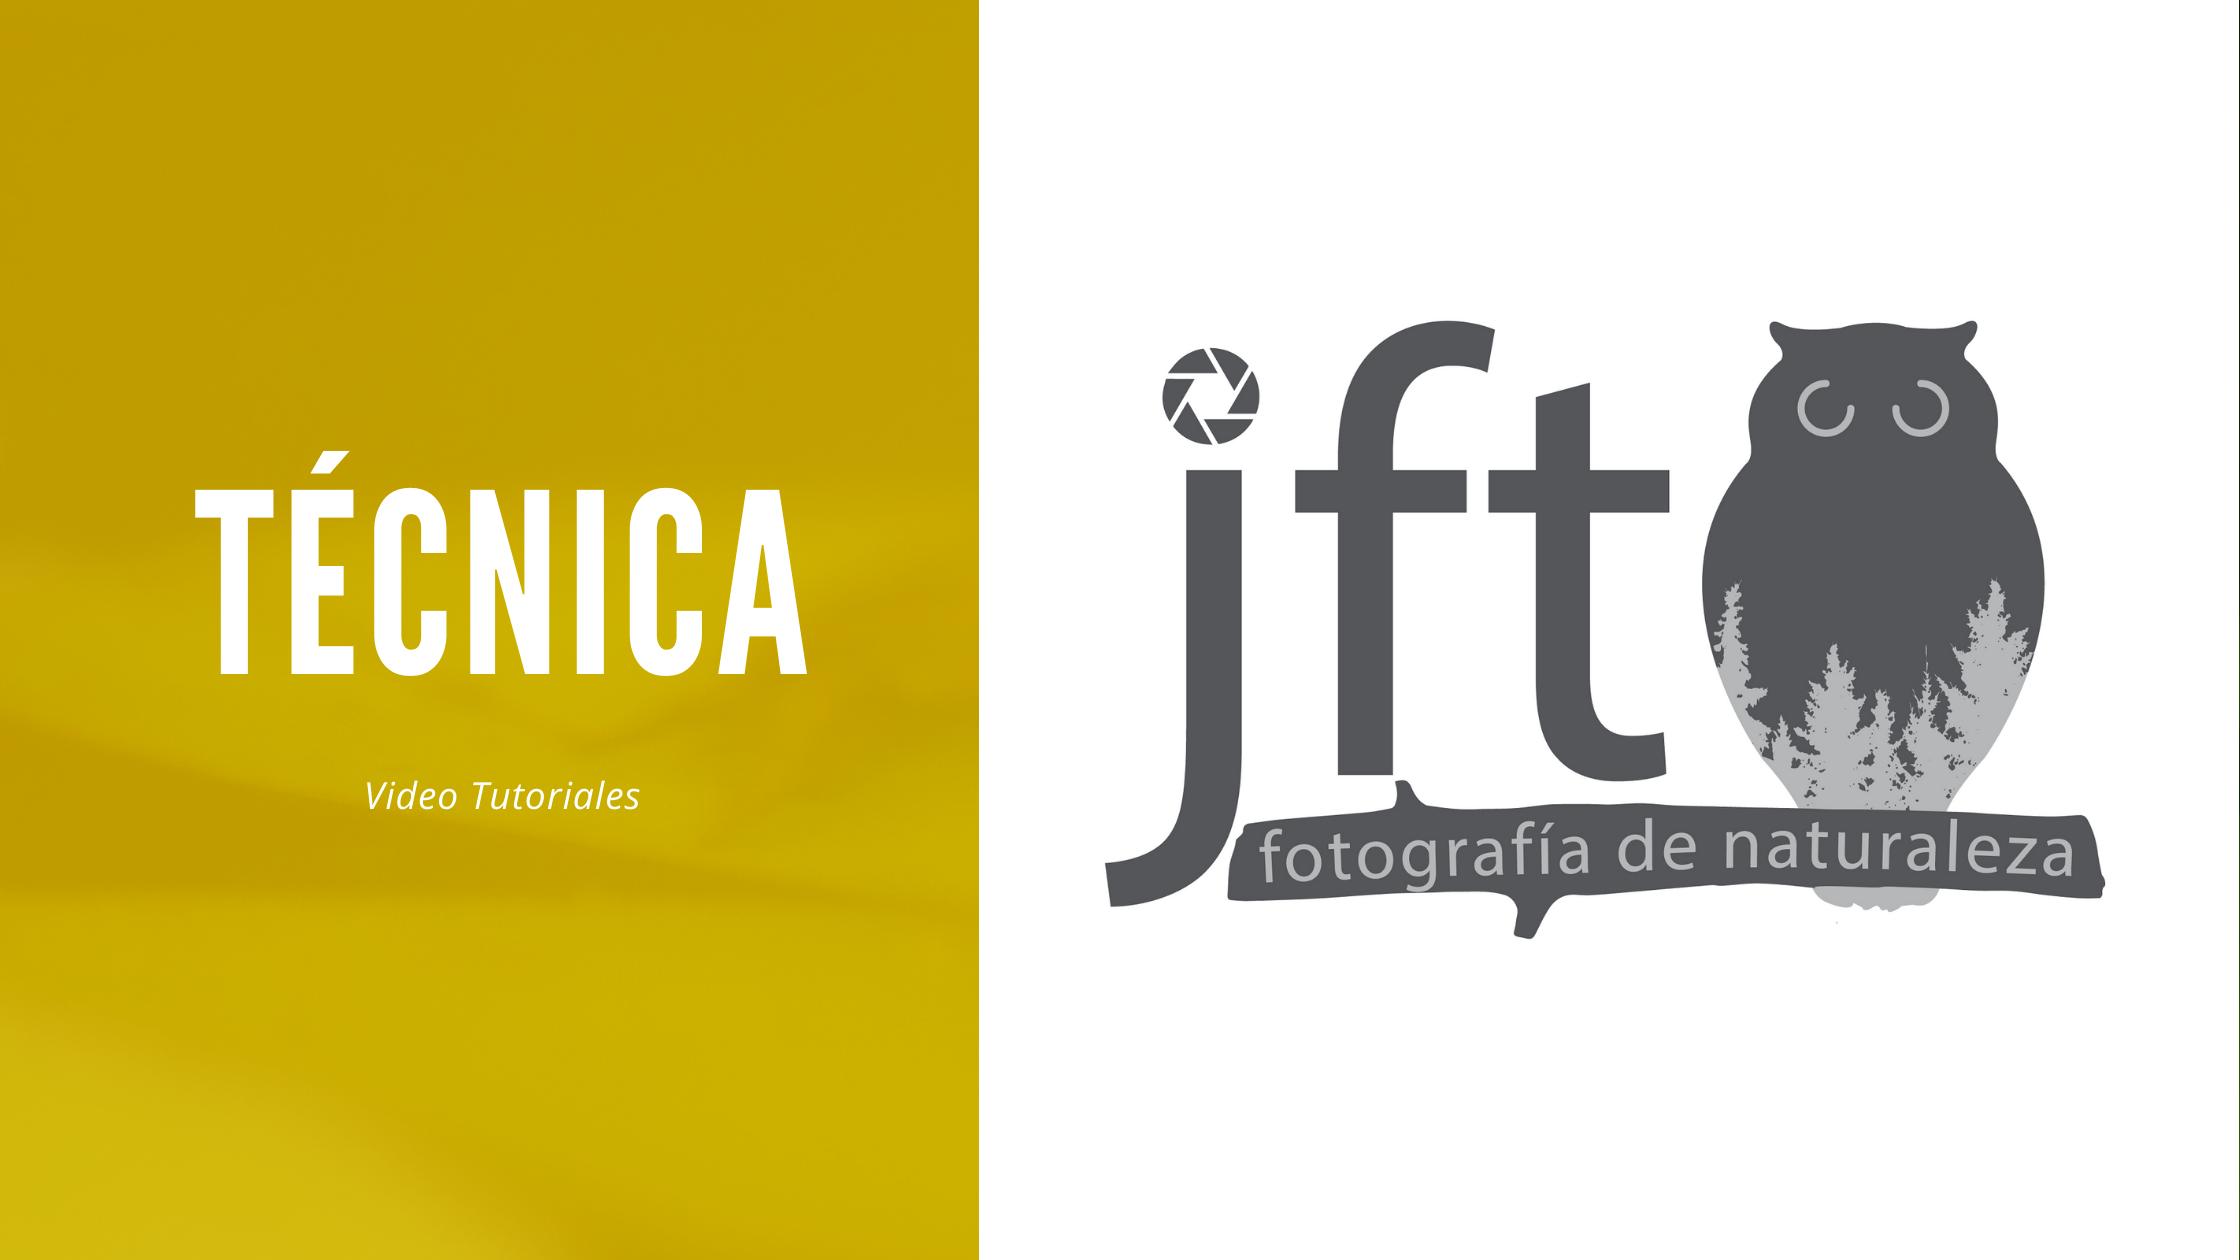 Técnica fotográfica - Video Tutoriales Tecnica fotografica. JFTFOTO